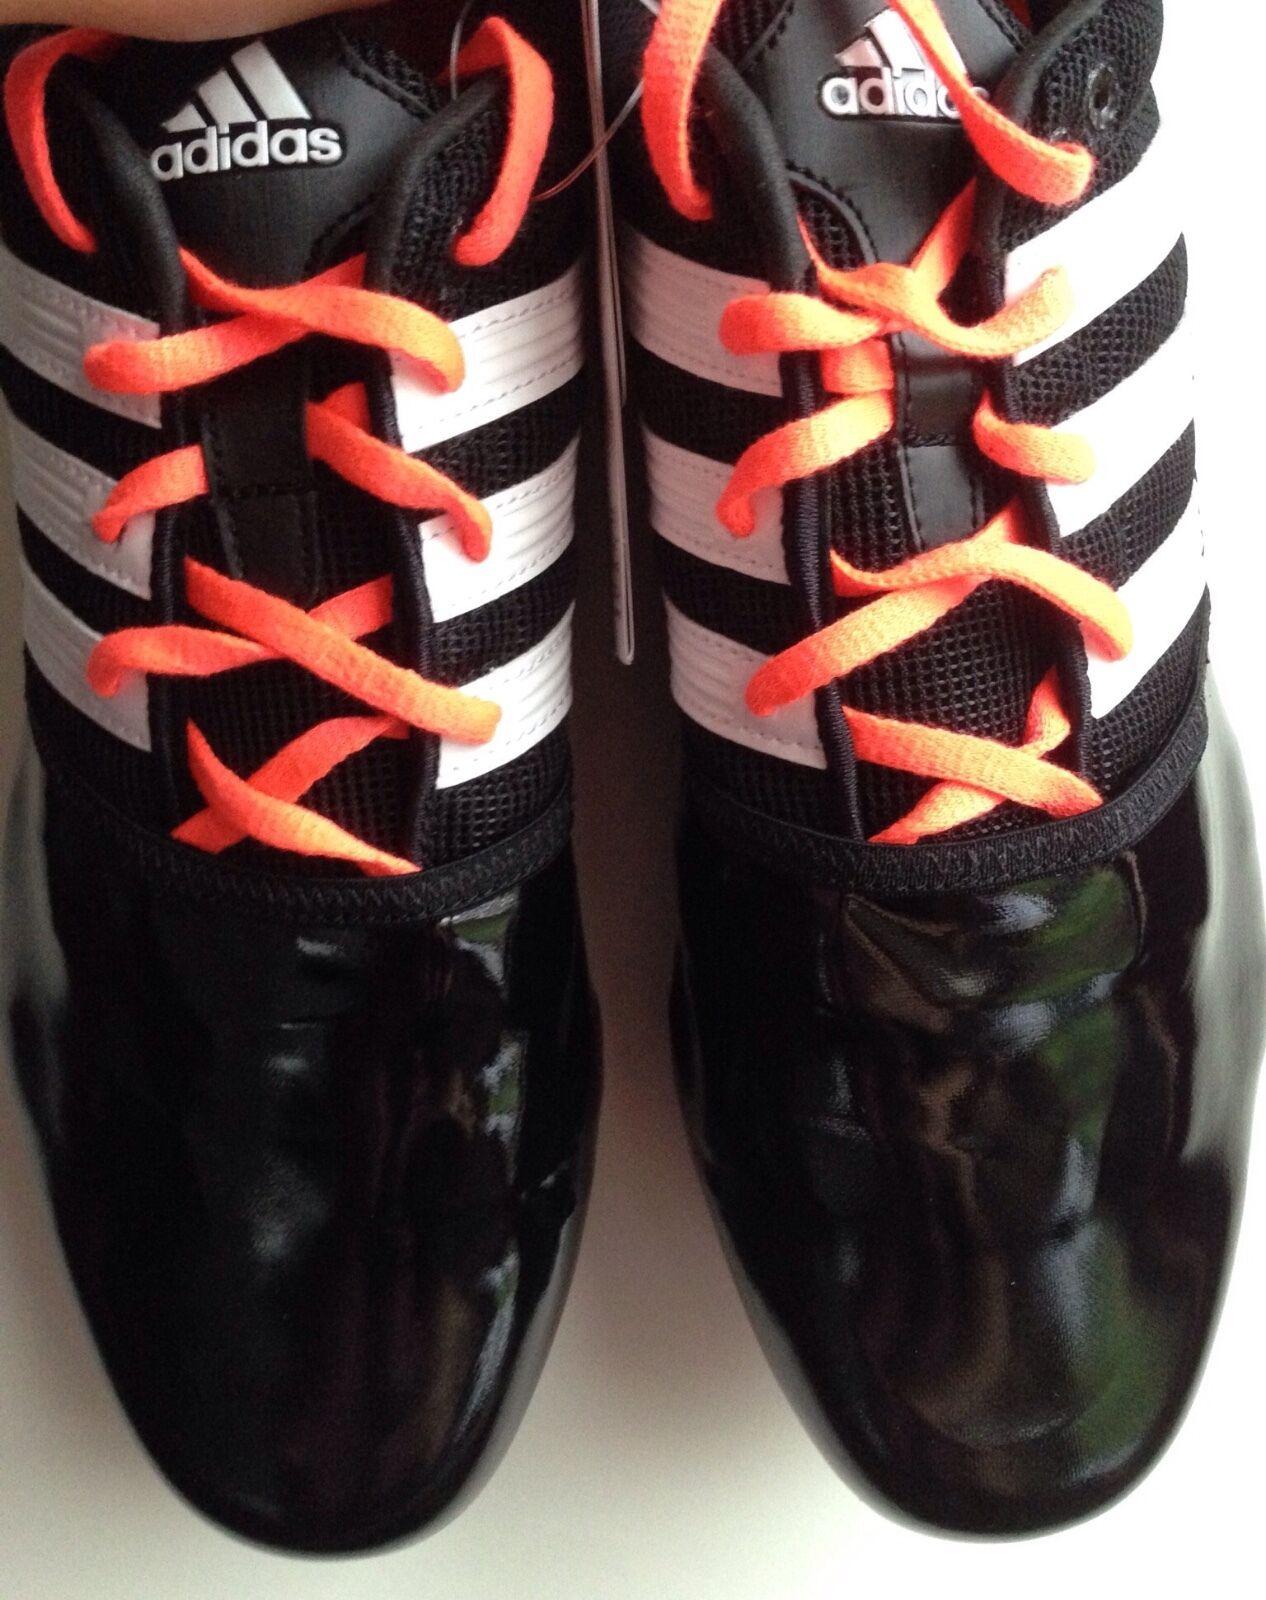 Adidas Men's Trainer's Jumpstar Field Spikes Black Training running shoe's